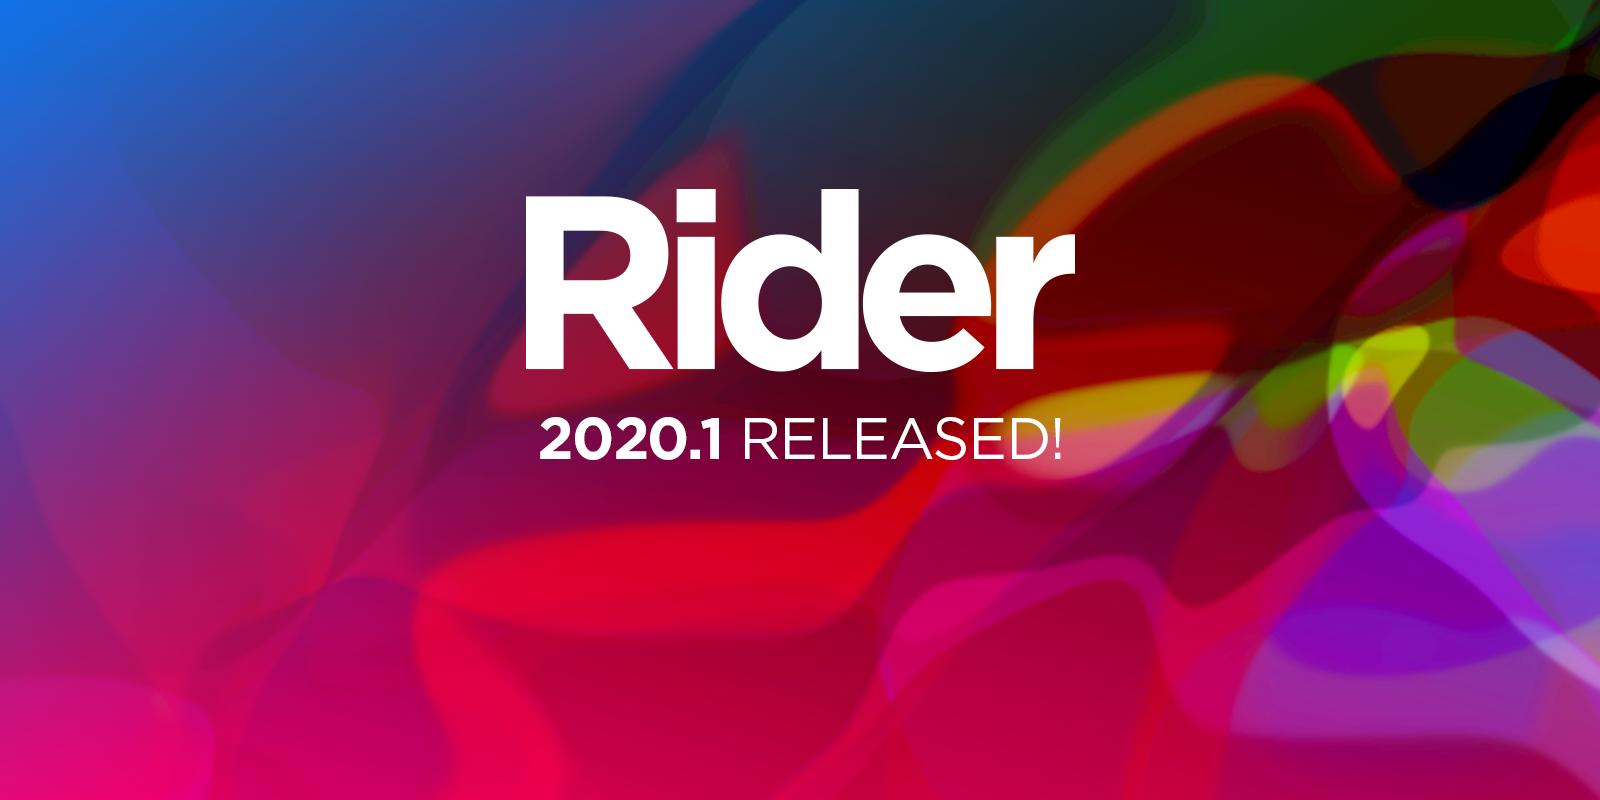 RIder 2020.1 release